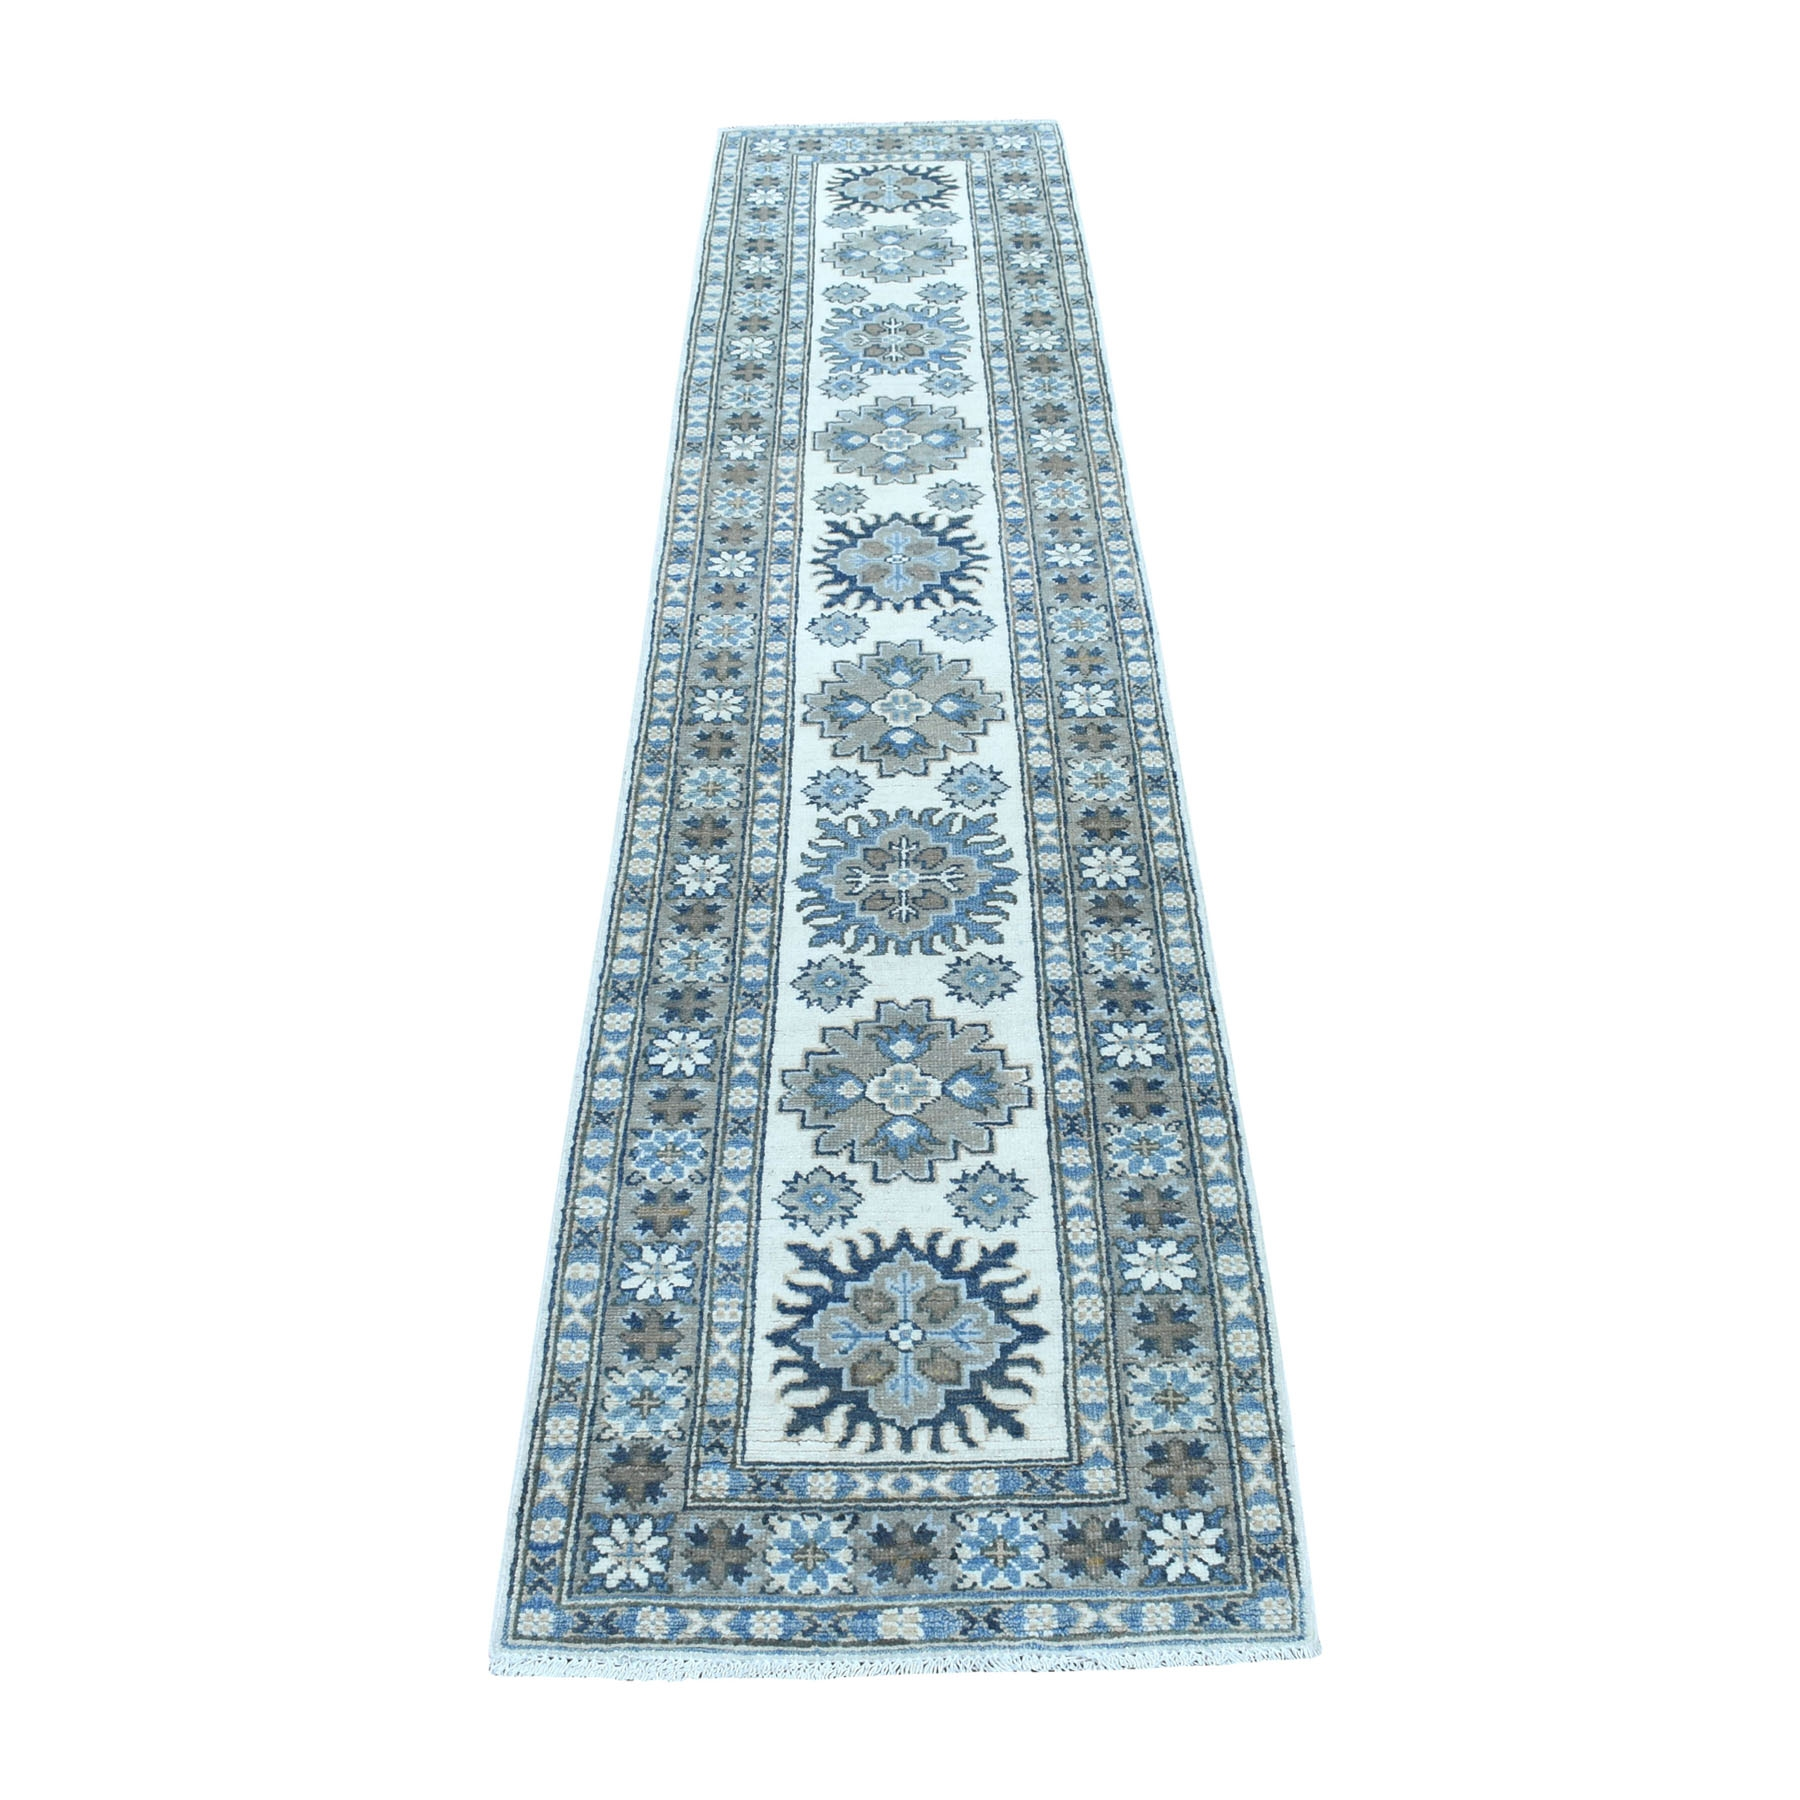 "2'1""x9'5"" Ivory Vintage Look Kazak Organic Wool Tribal Design Hand Knotted Runner Oriental Rug"